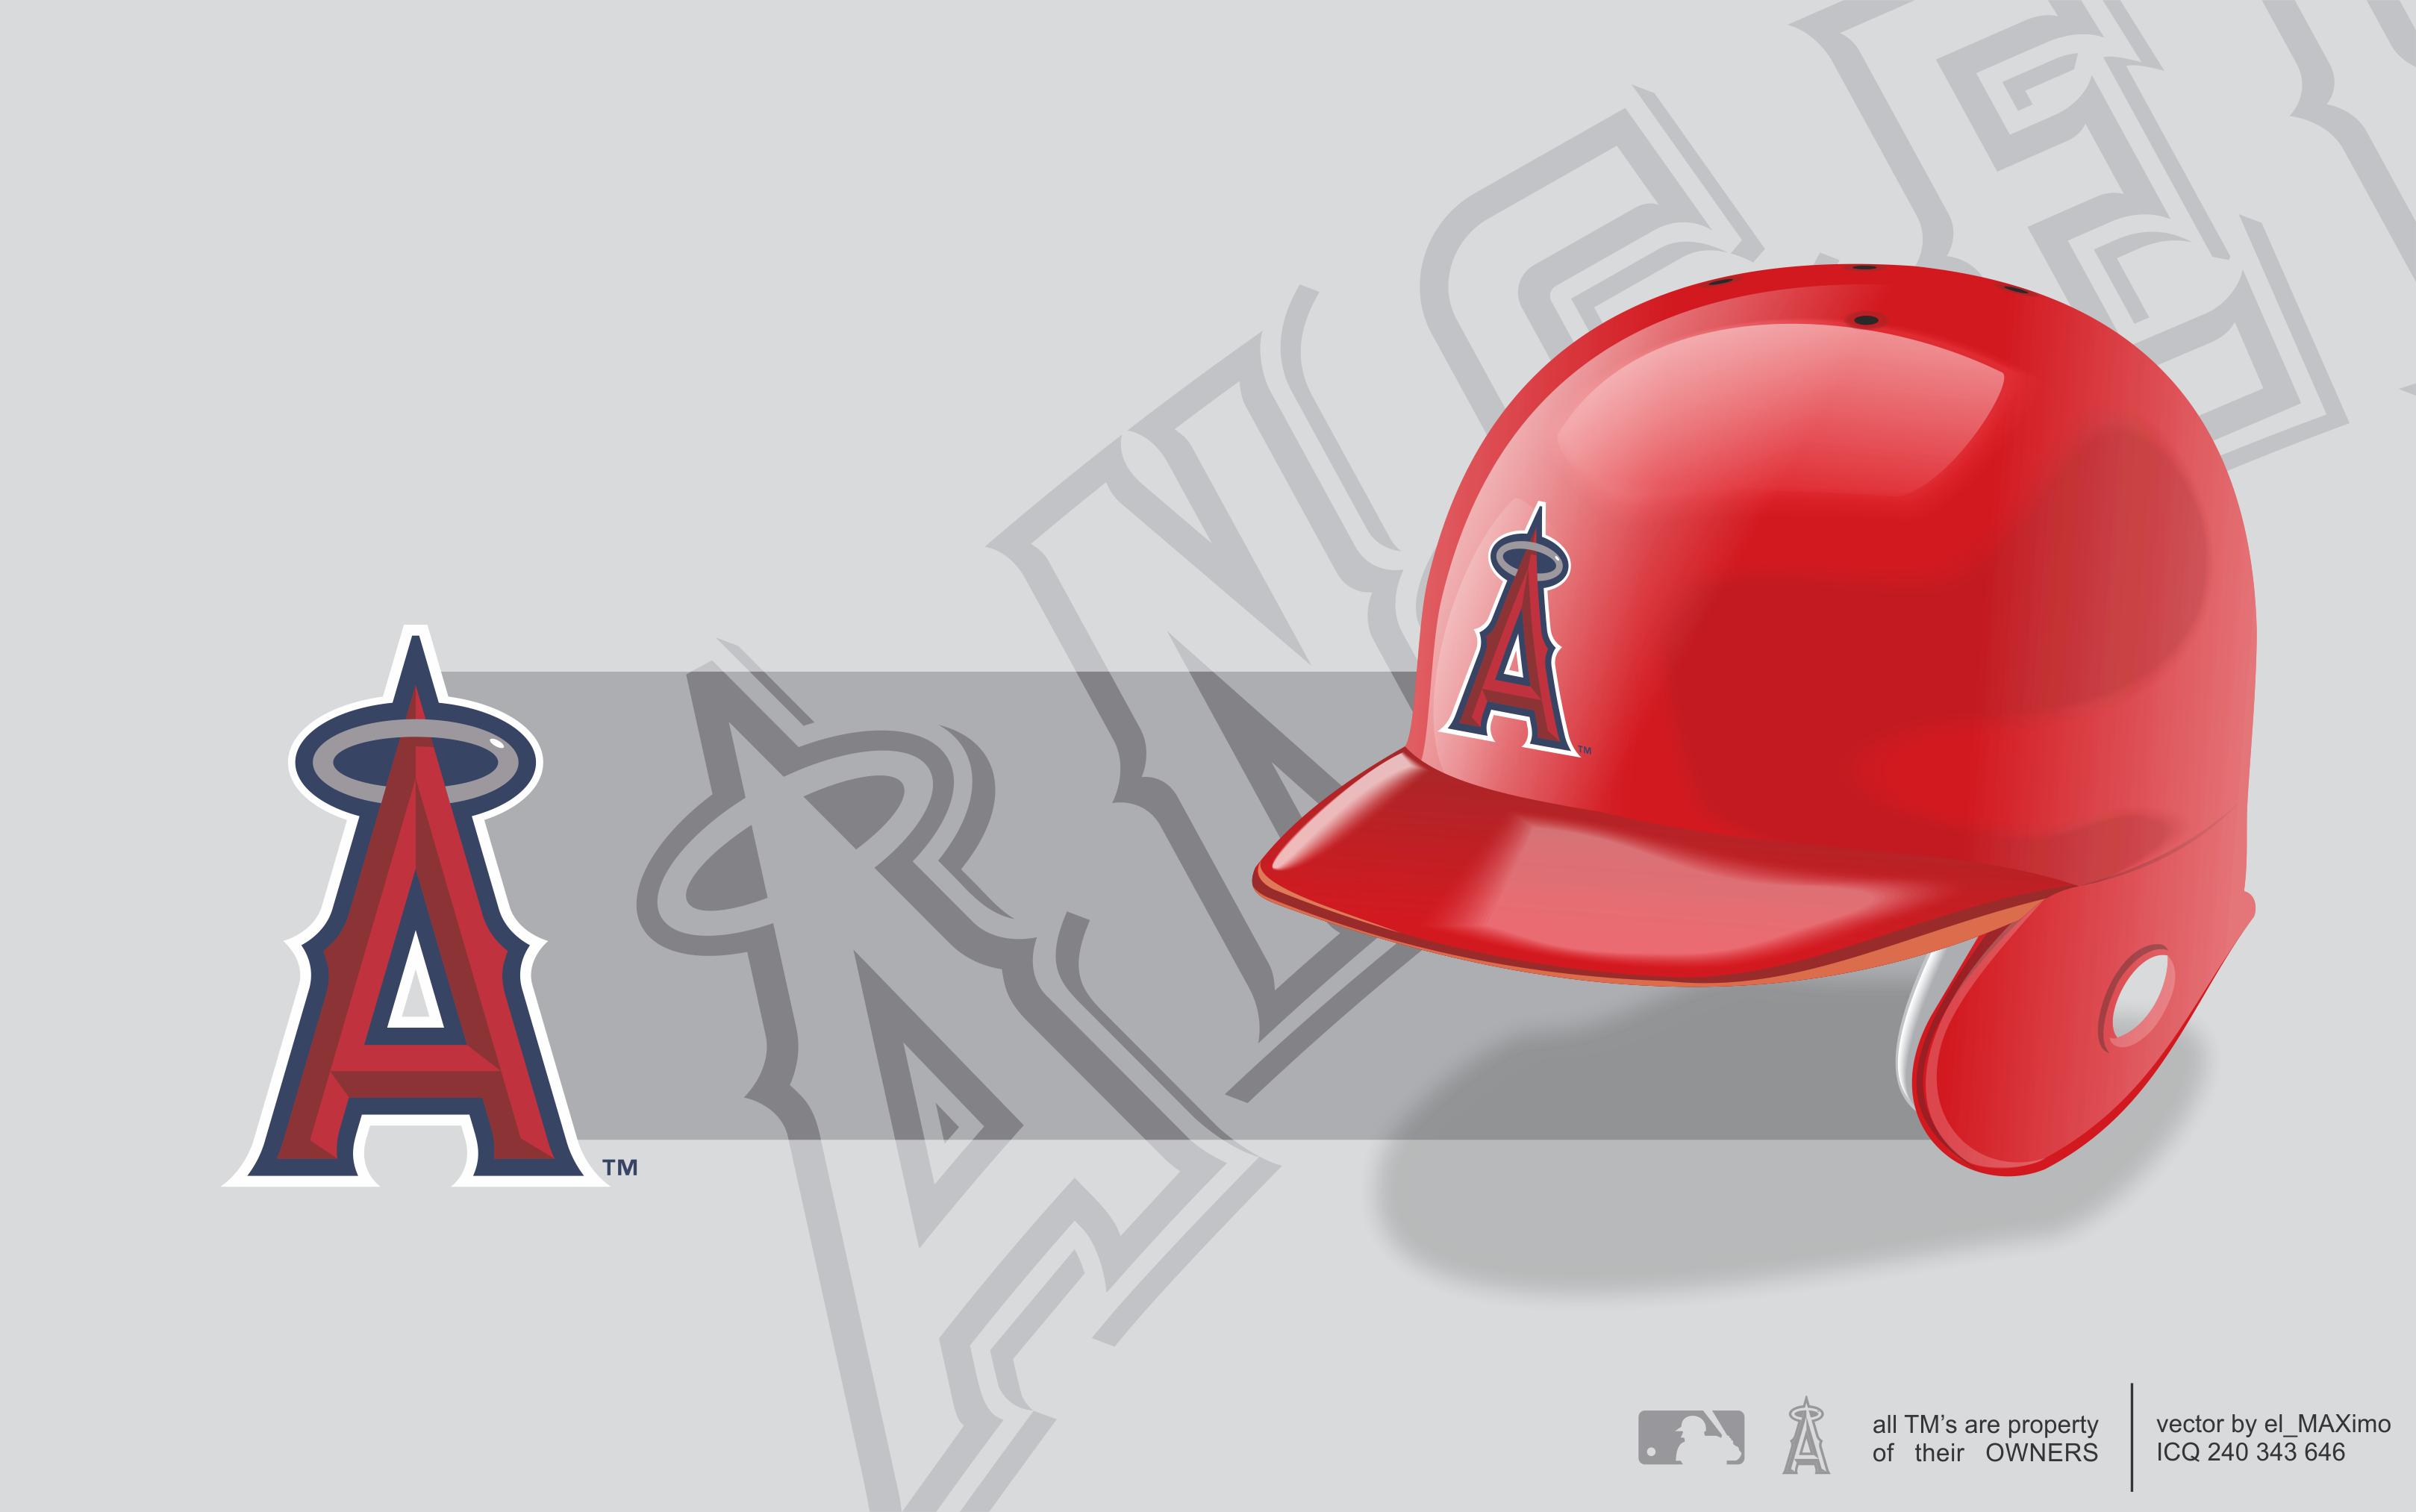 ANAHEIM ANGELS baseball mlb ek wallpaper 3237x2026 158467 3237x2026